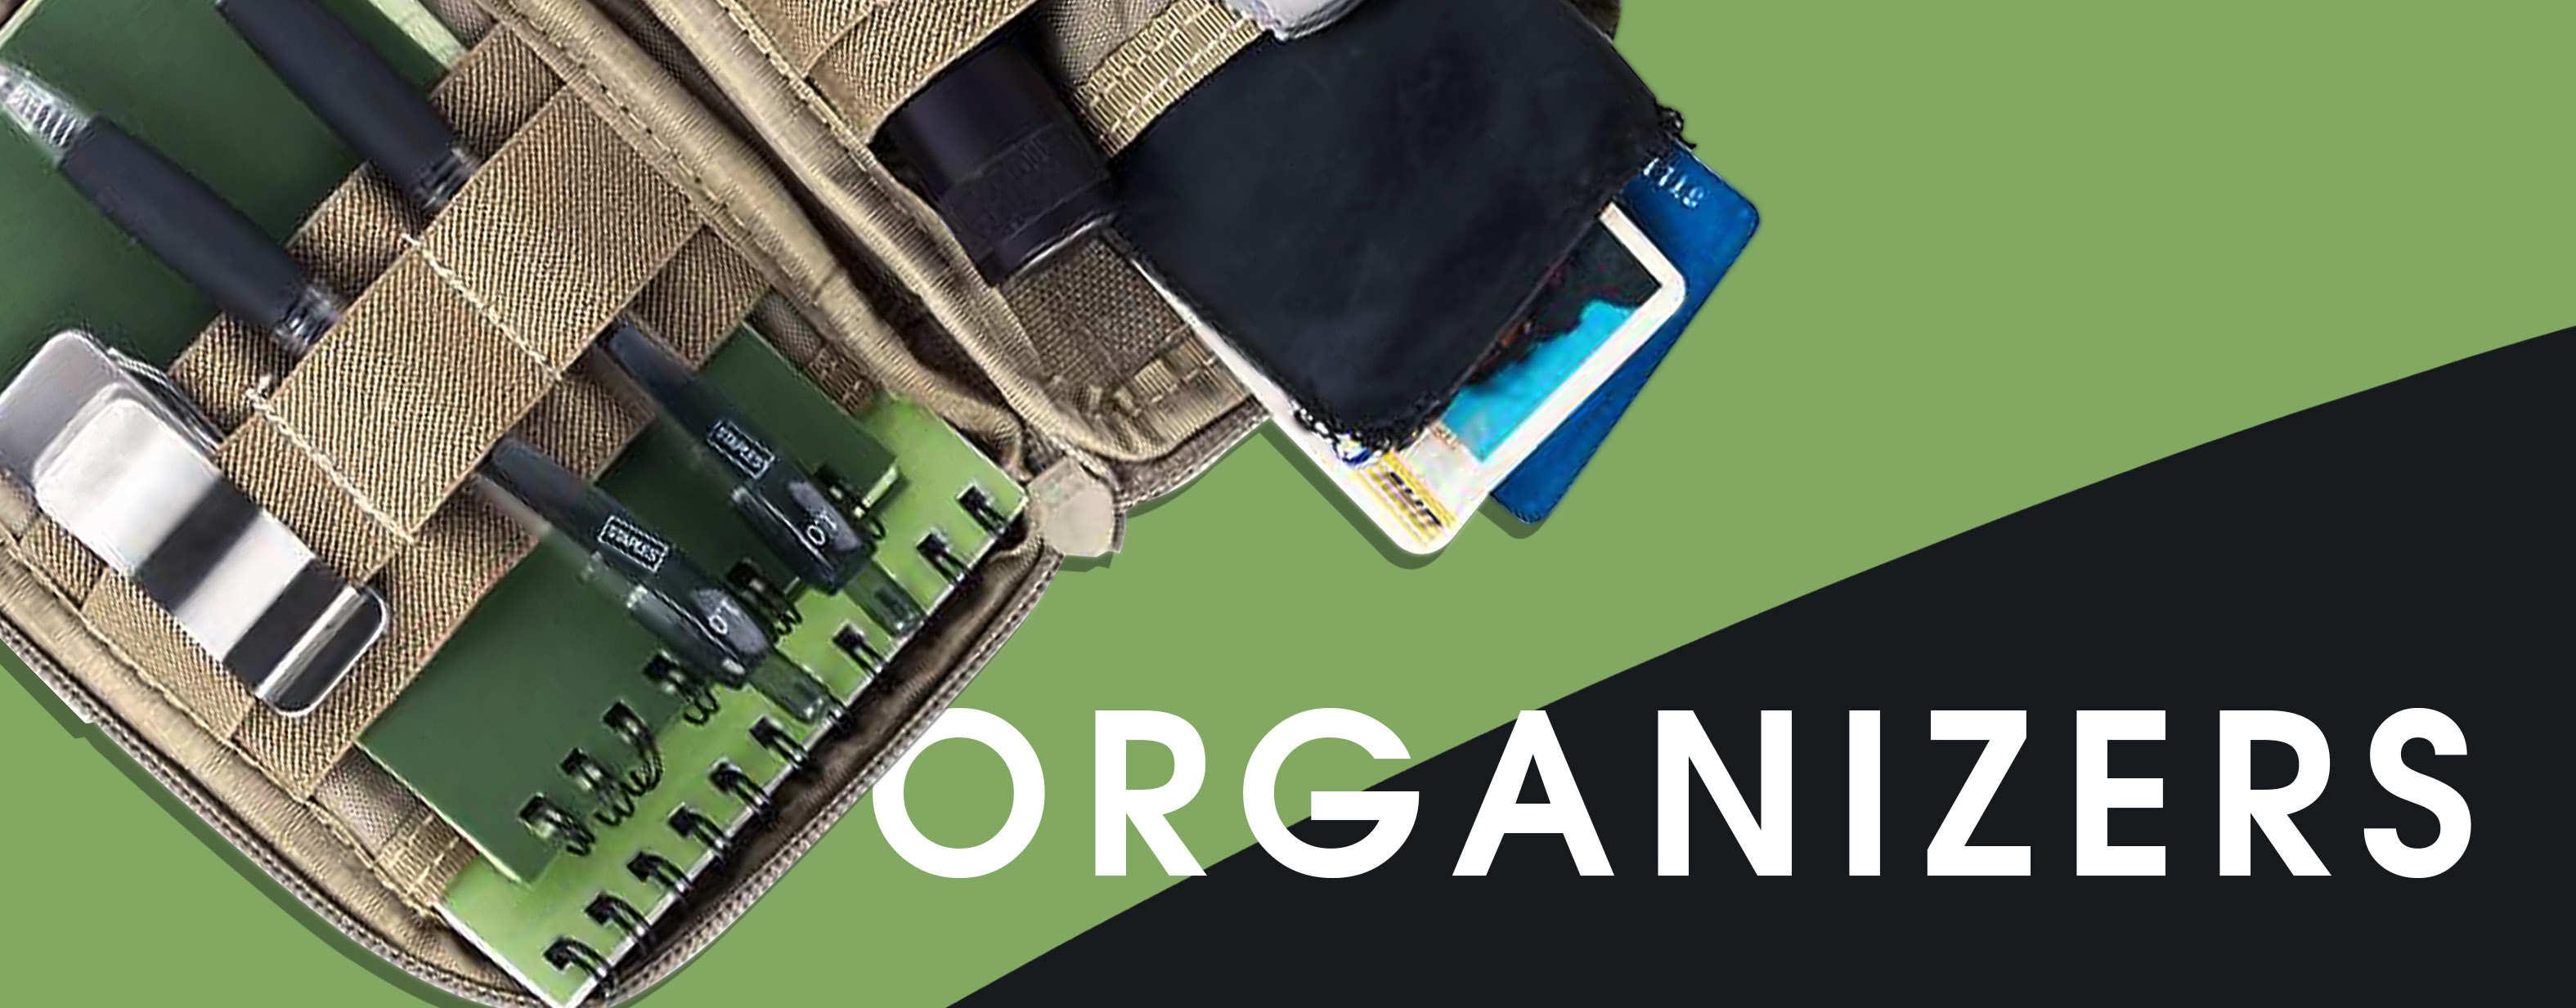 organizers-756-.jpg